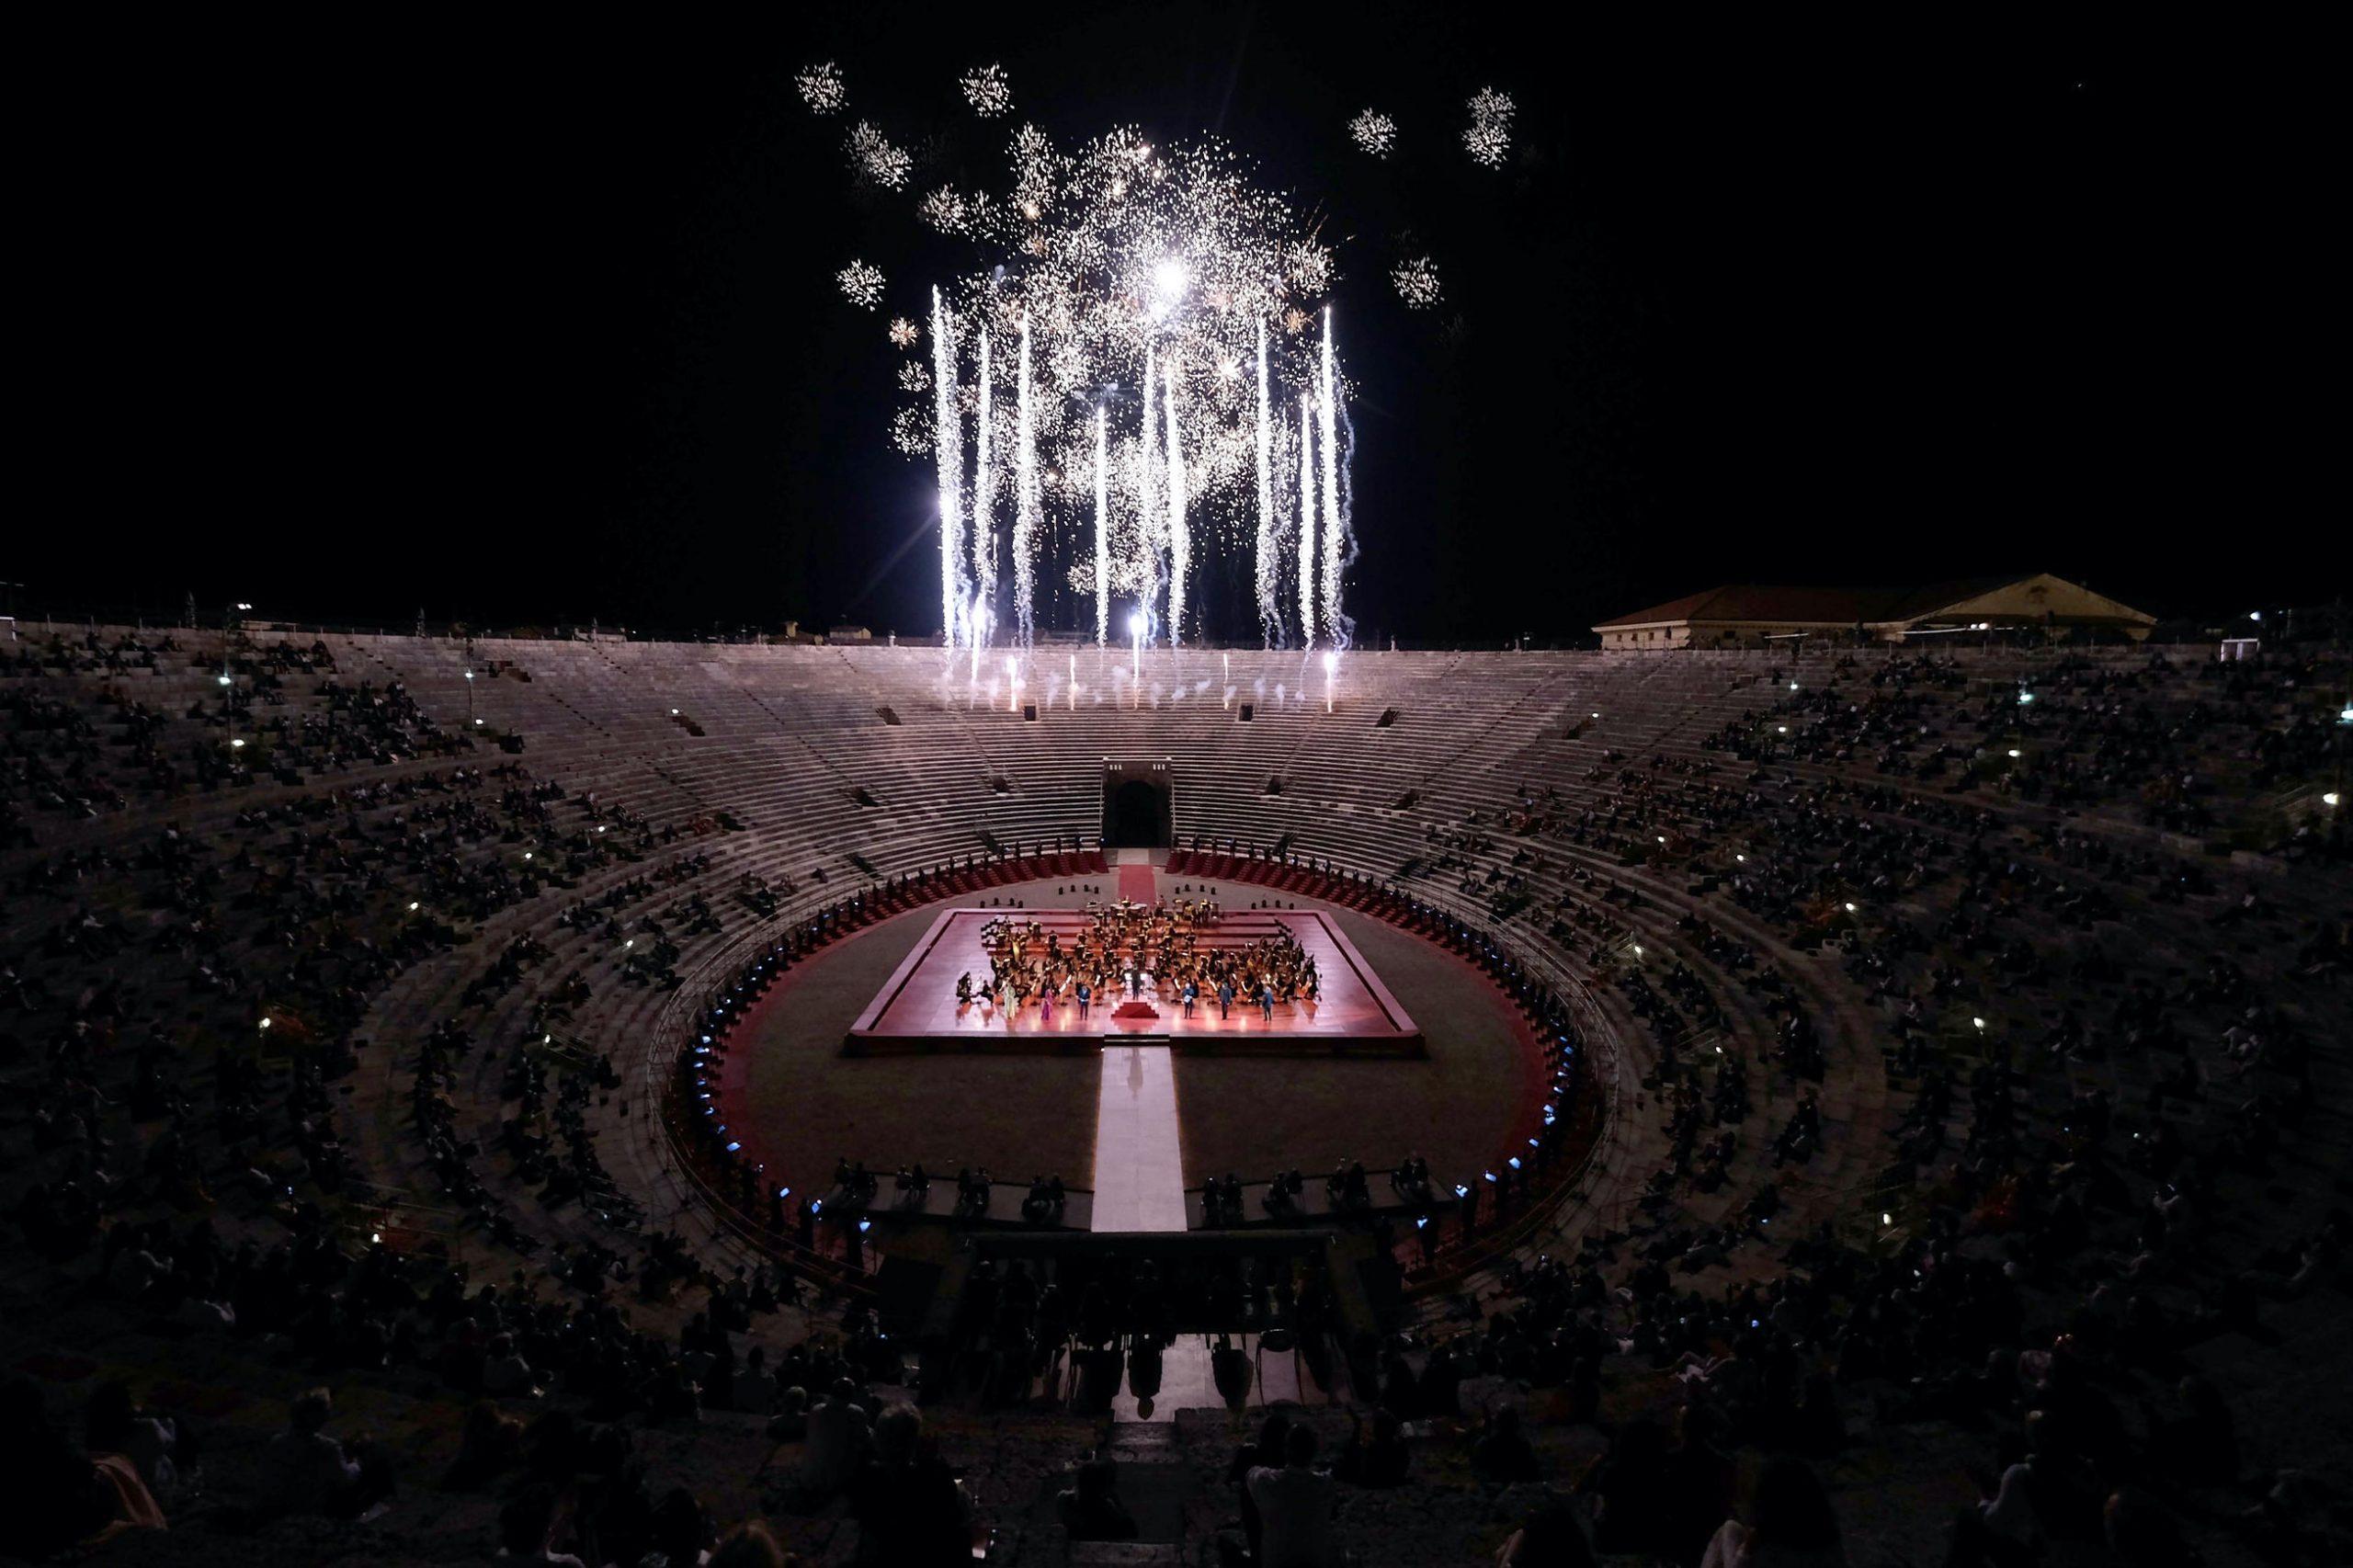 Rossini Gala - Arena di Verona